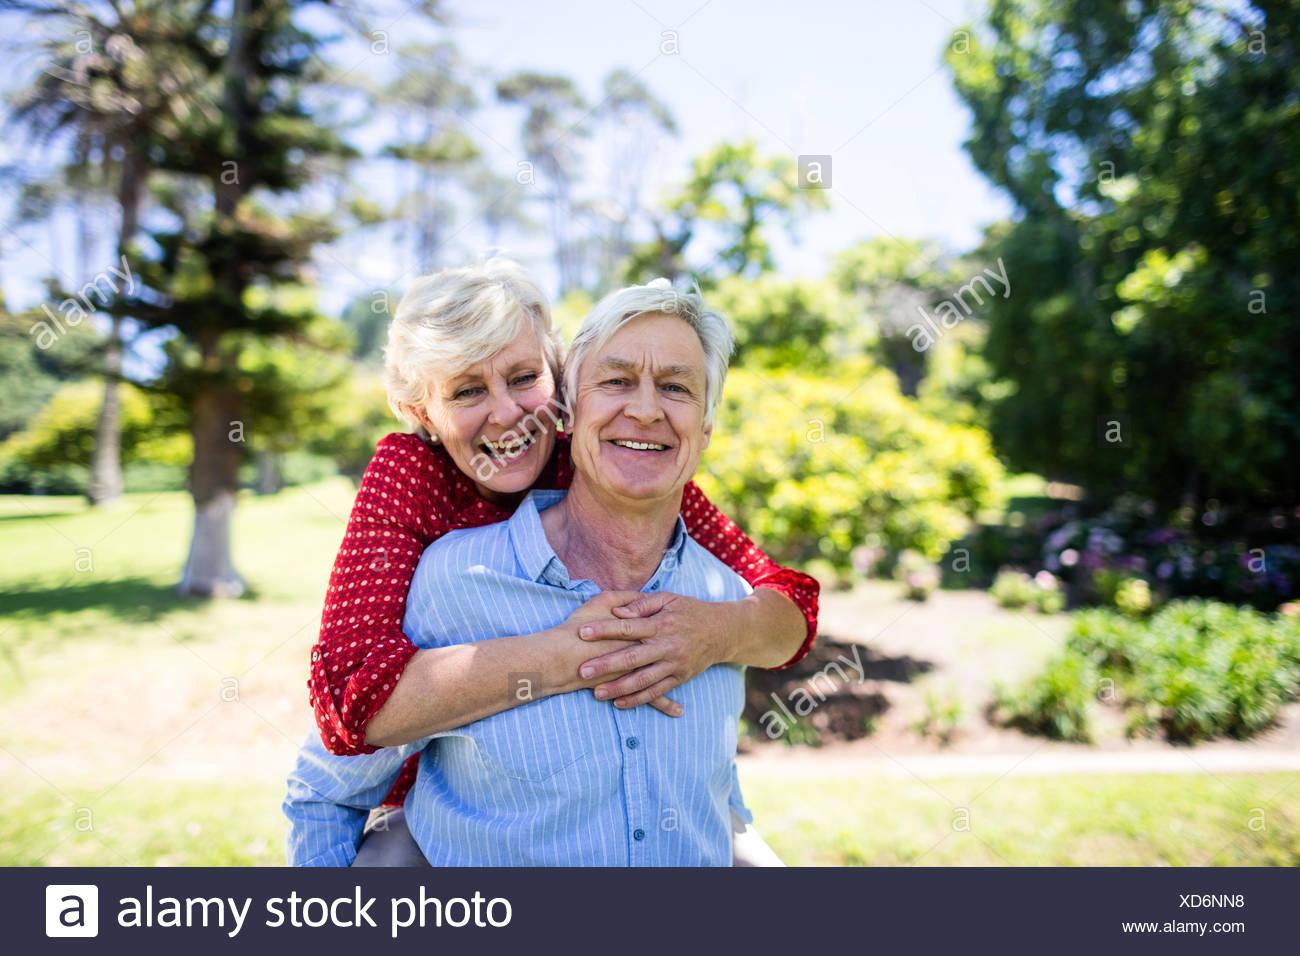 Happy senior man giving a piggy back to senior woman Photo Stock